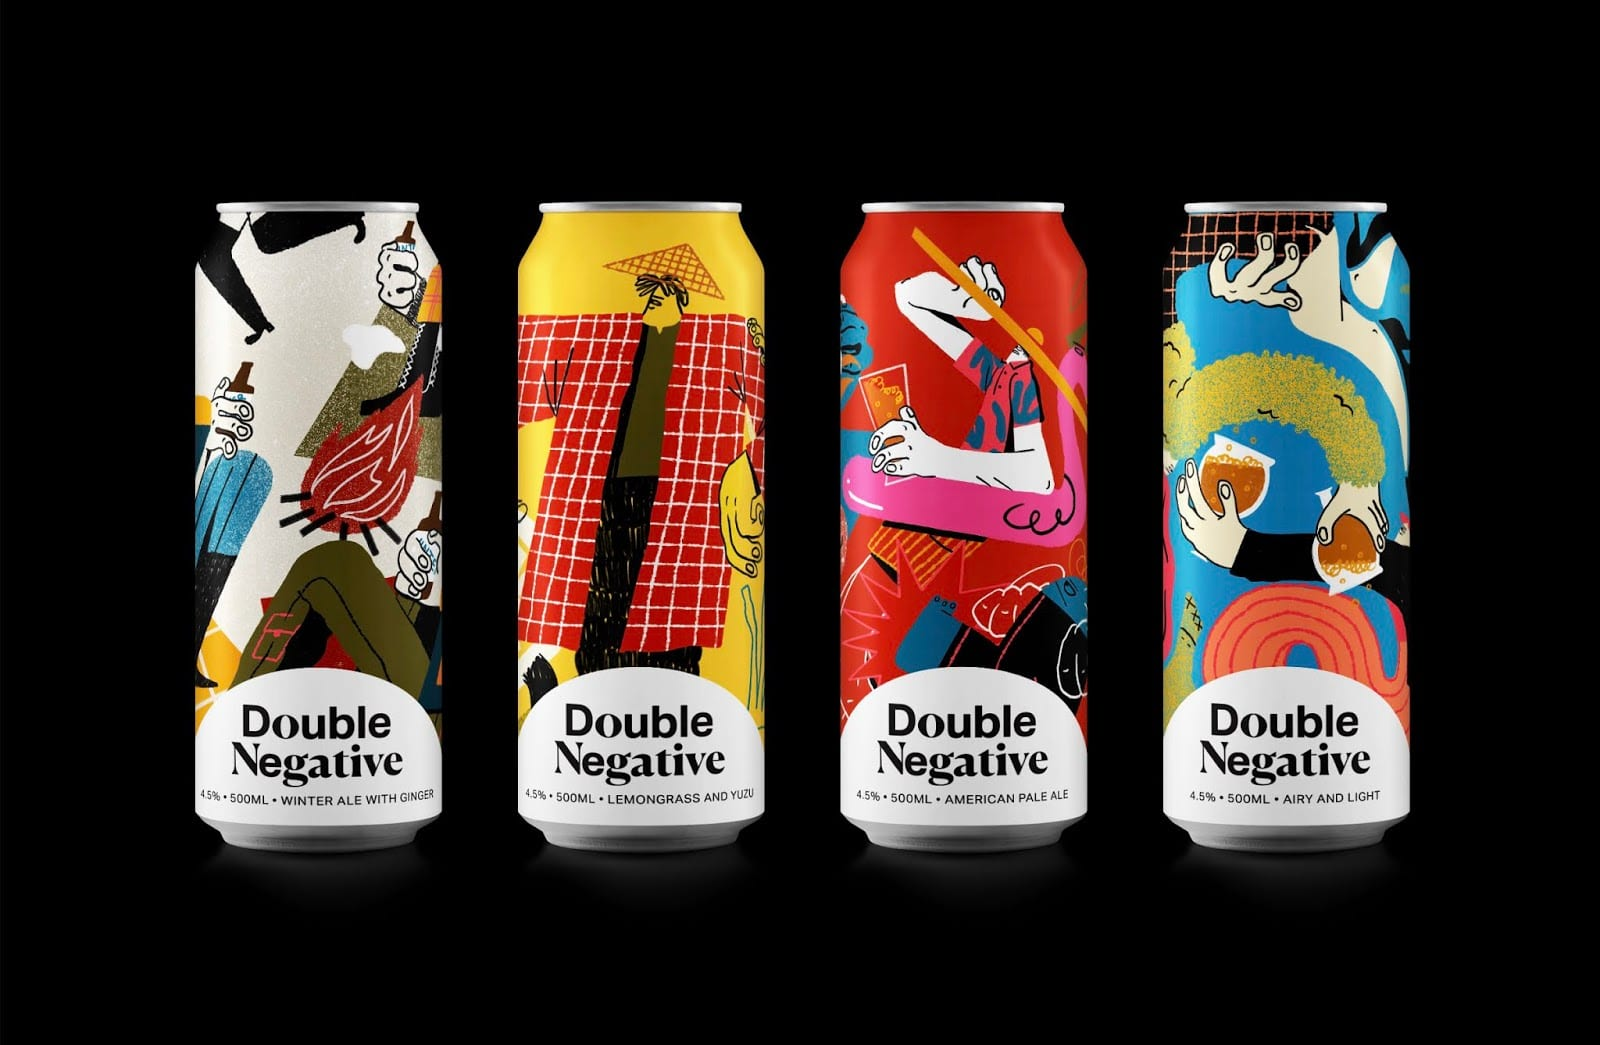 ach tie obaly – double negative artisanal brewery - Ach, tie obaly – Double Negative Artisanal Brewery